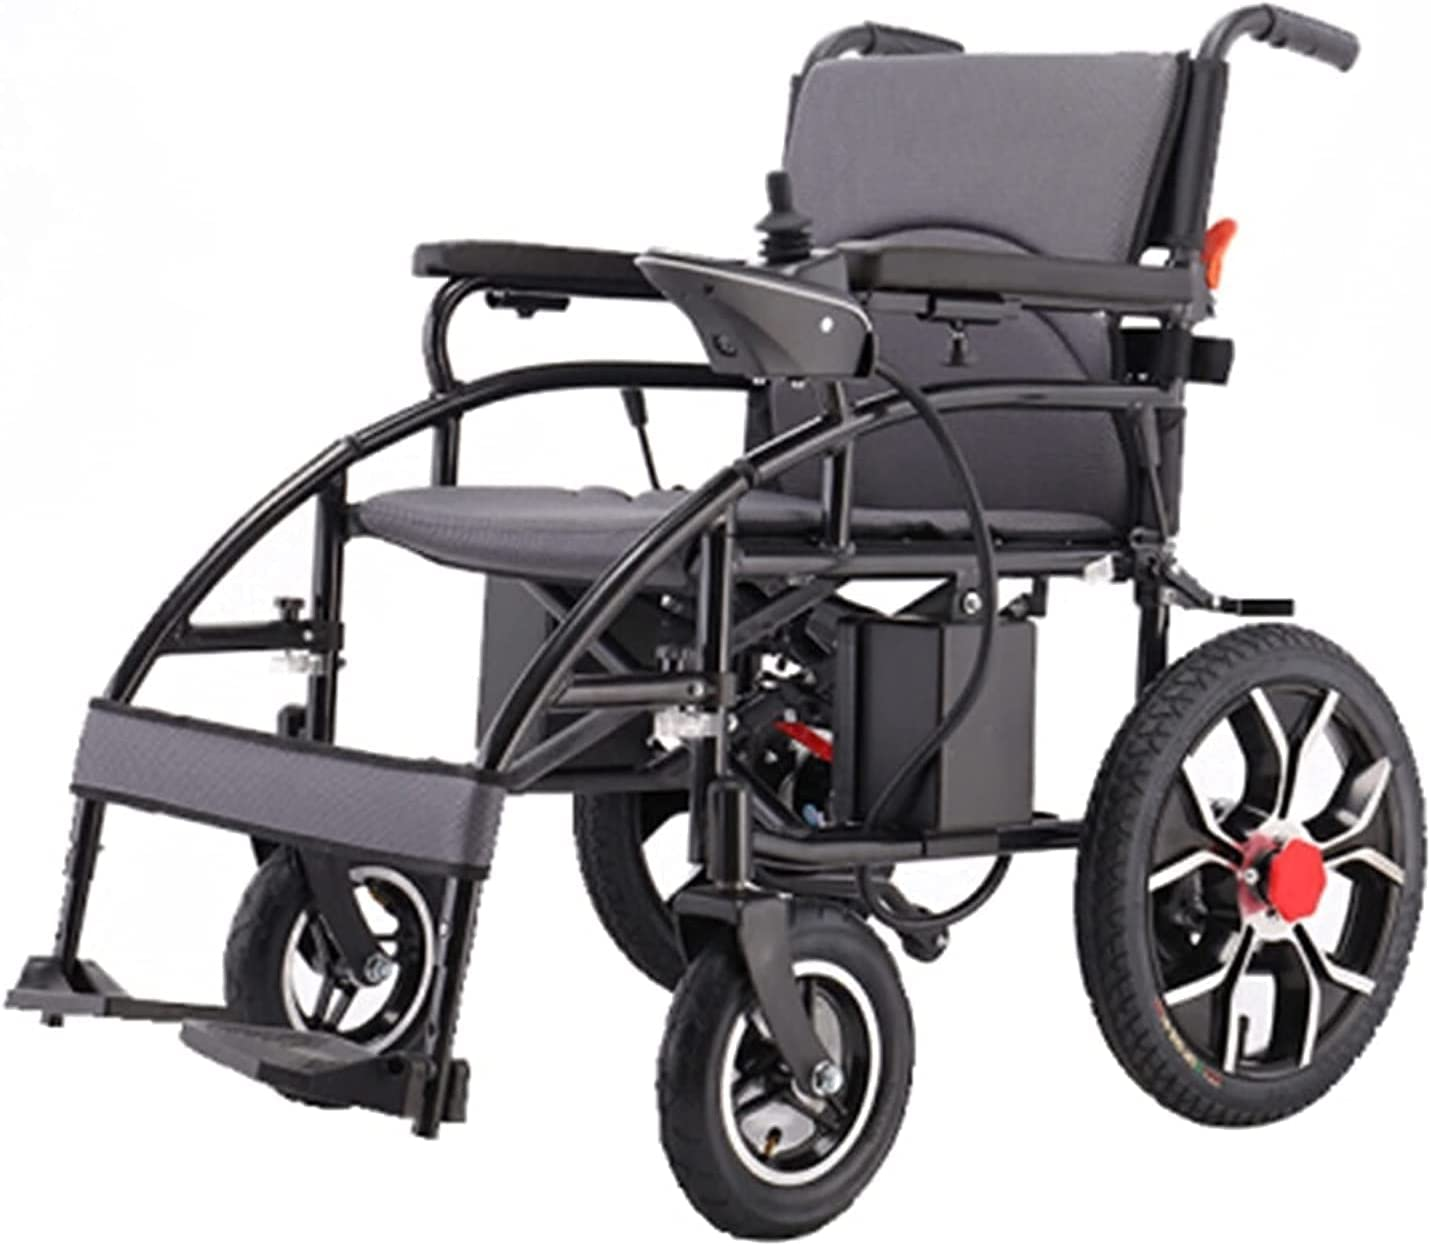 Electric Wheelchair Max 55% OFF All-Terrain Max 46% OFF Heavy-Duty Powerful L Dual-Motor